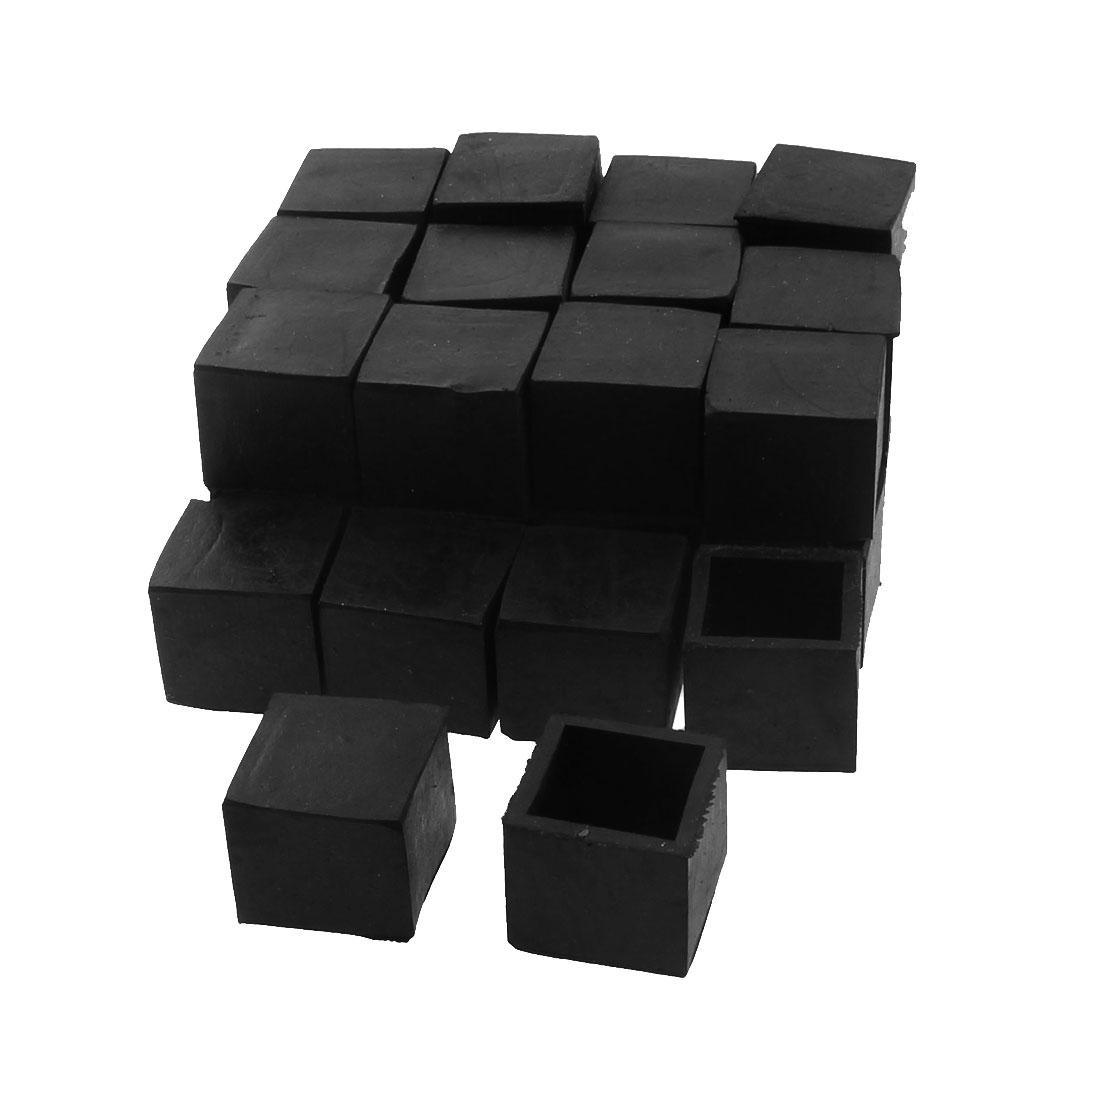 25mm x 25mm Square Shaped Furniture Table Desk Foot Leg Rubber End Cap Cover Black 30pcs